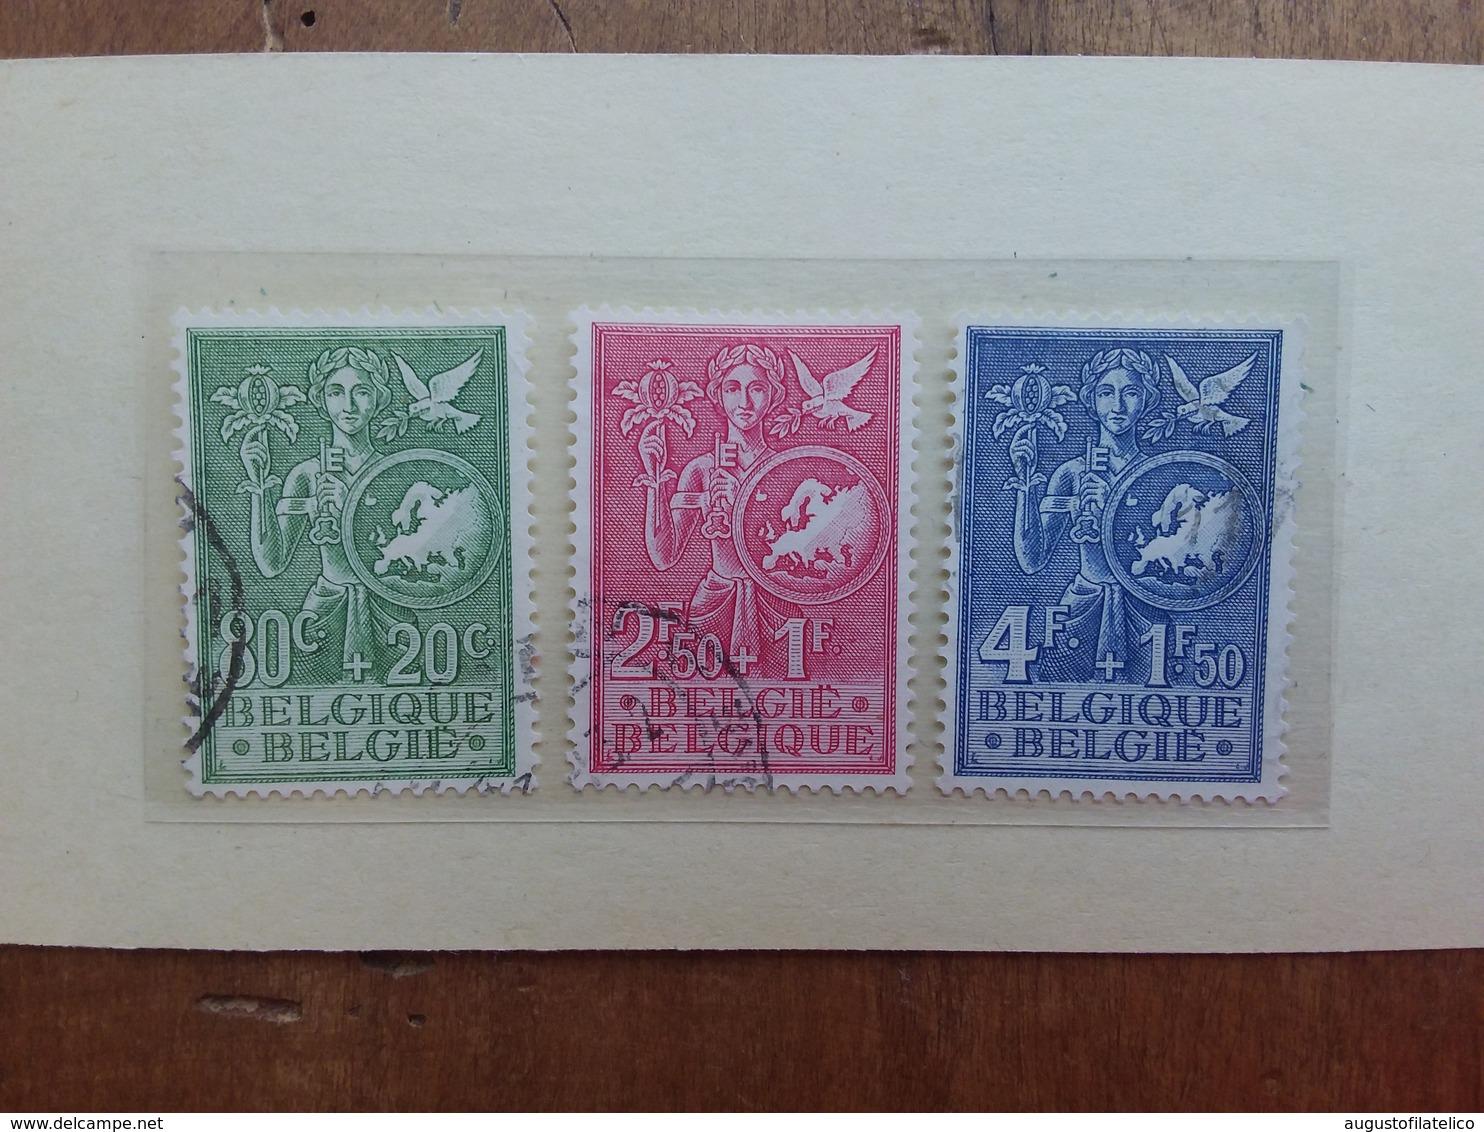 BELGIO 1953 - Ufficio Europeo Gioventù Nn. 927/29 Timbrati + Spese Postali - Belgio